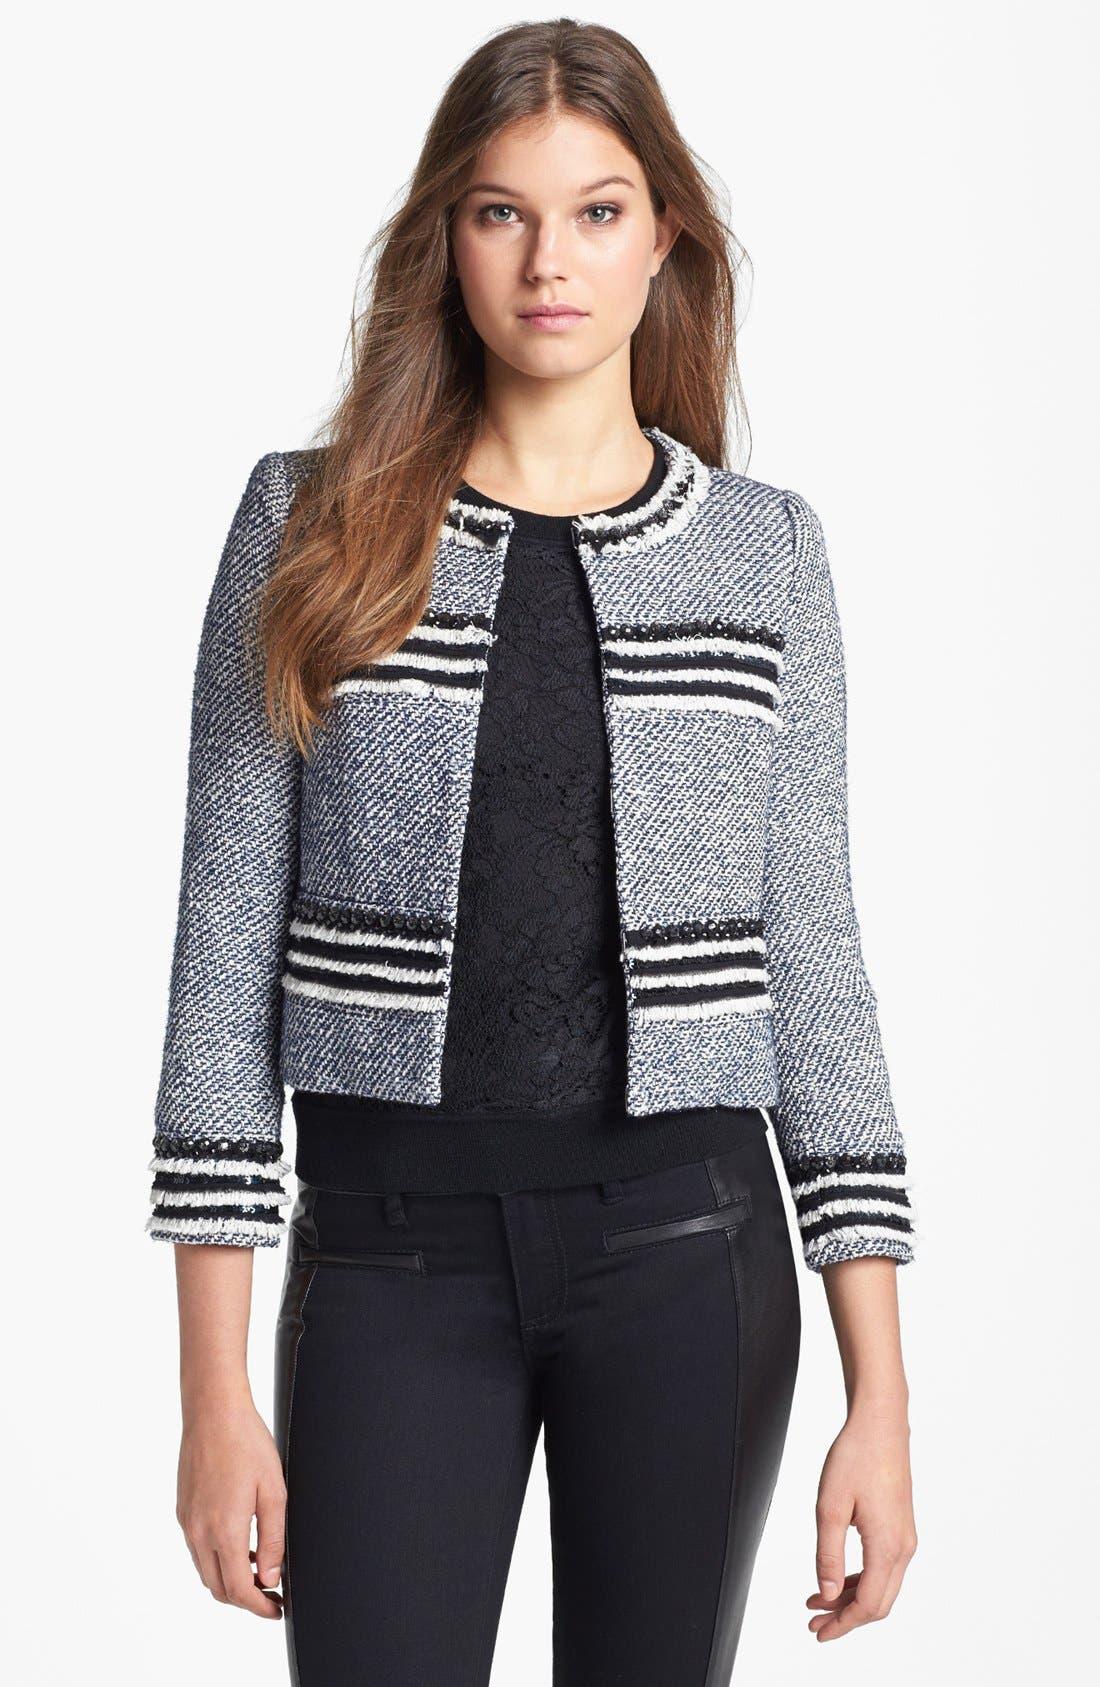 Main Image - Tory Burch 'Rosemary' Crop Tweed Jacket